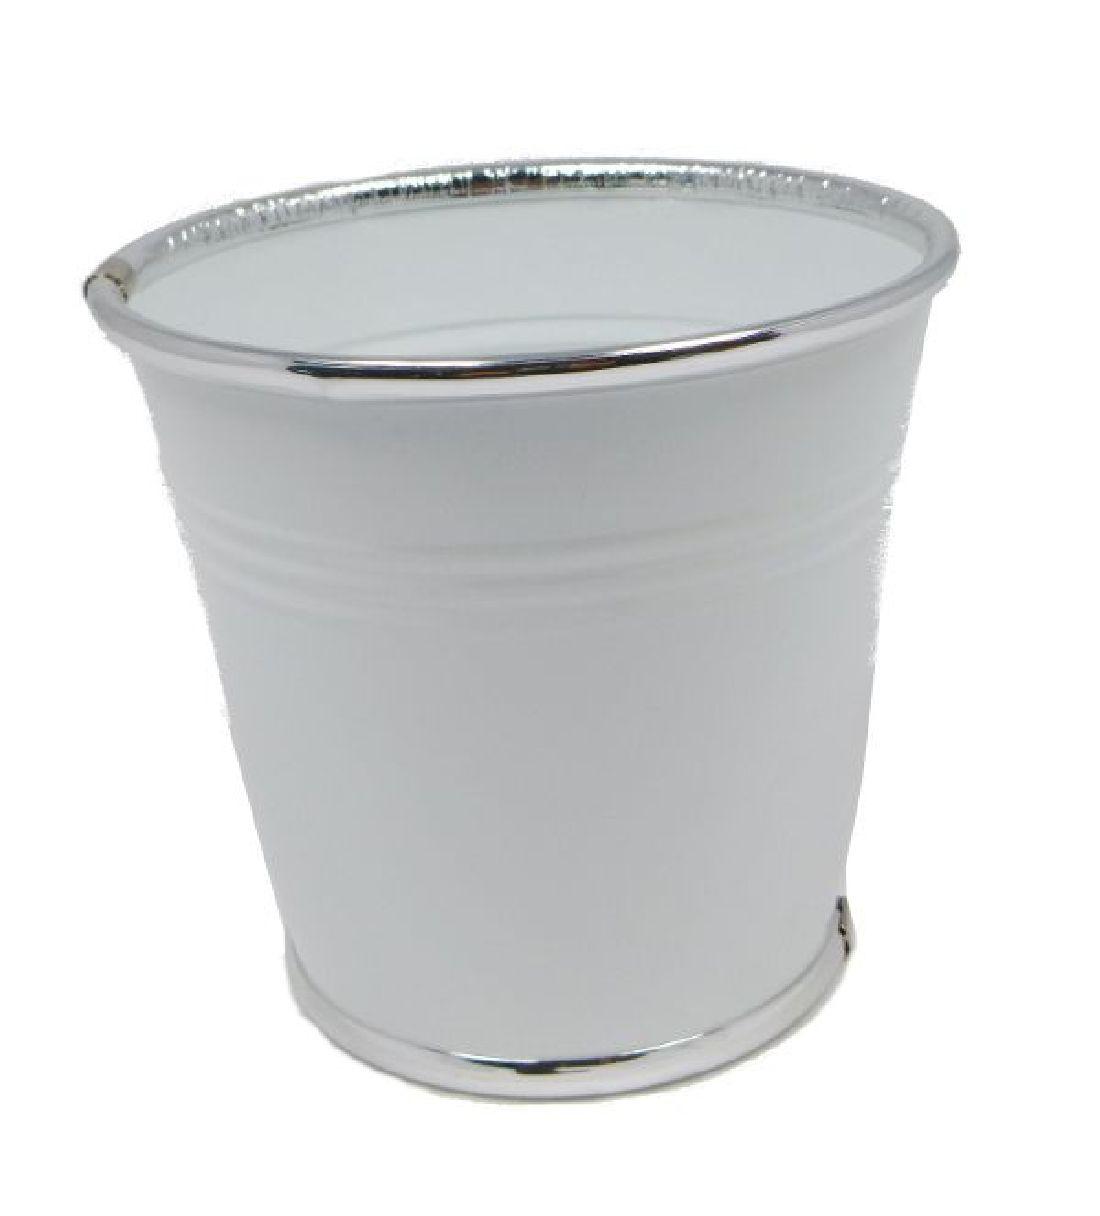 Topf Minio WEISS 16130 Silberrand 14,5x13x10cm Metalltopf